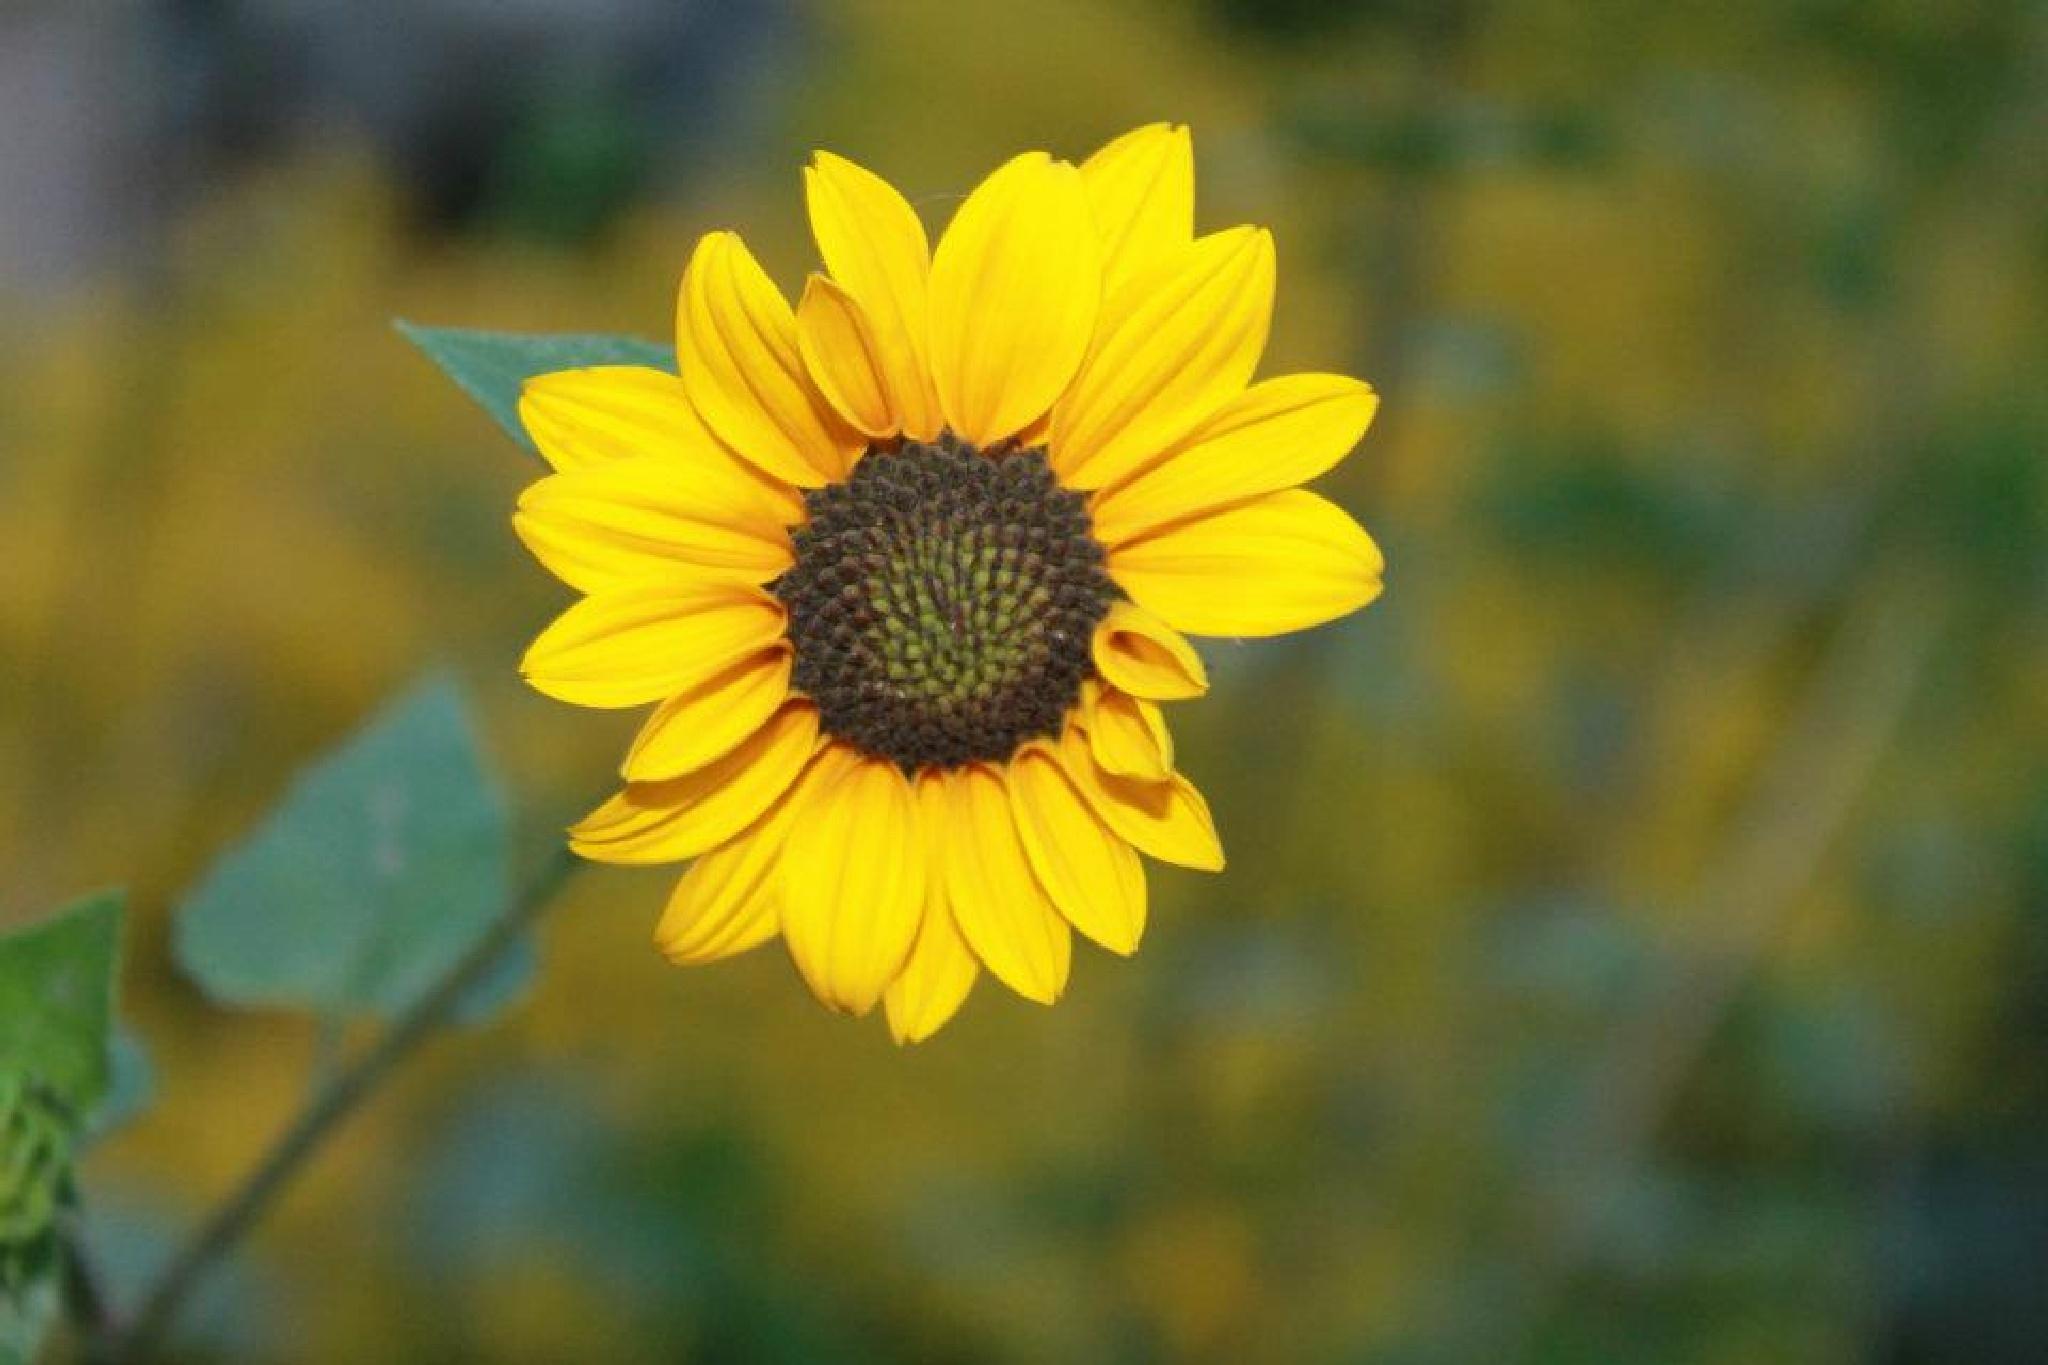 Sunny Flower by Archana Sawant